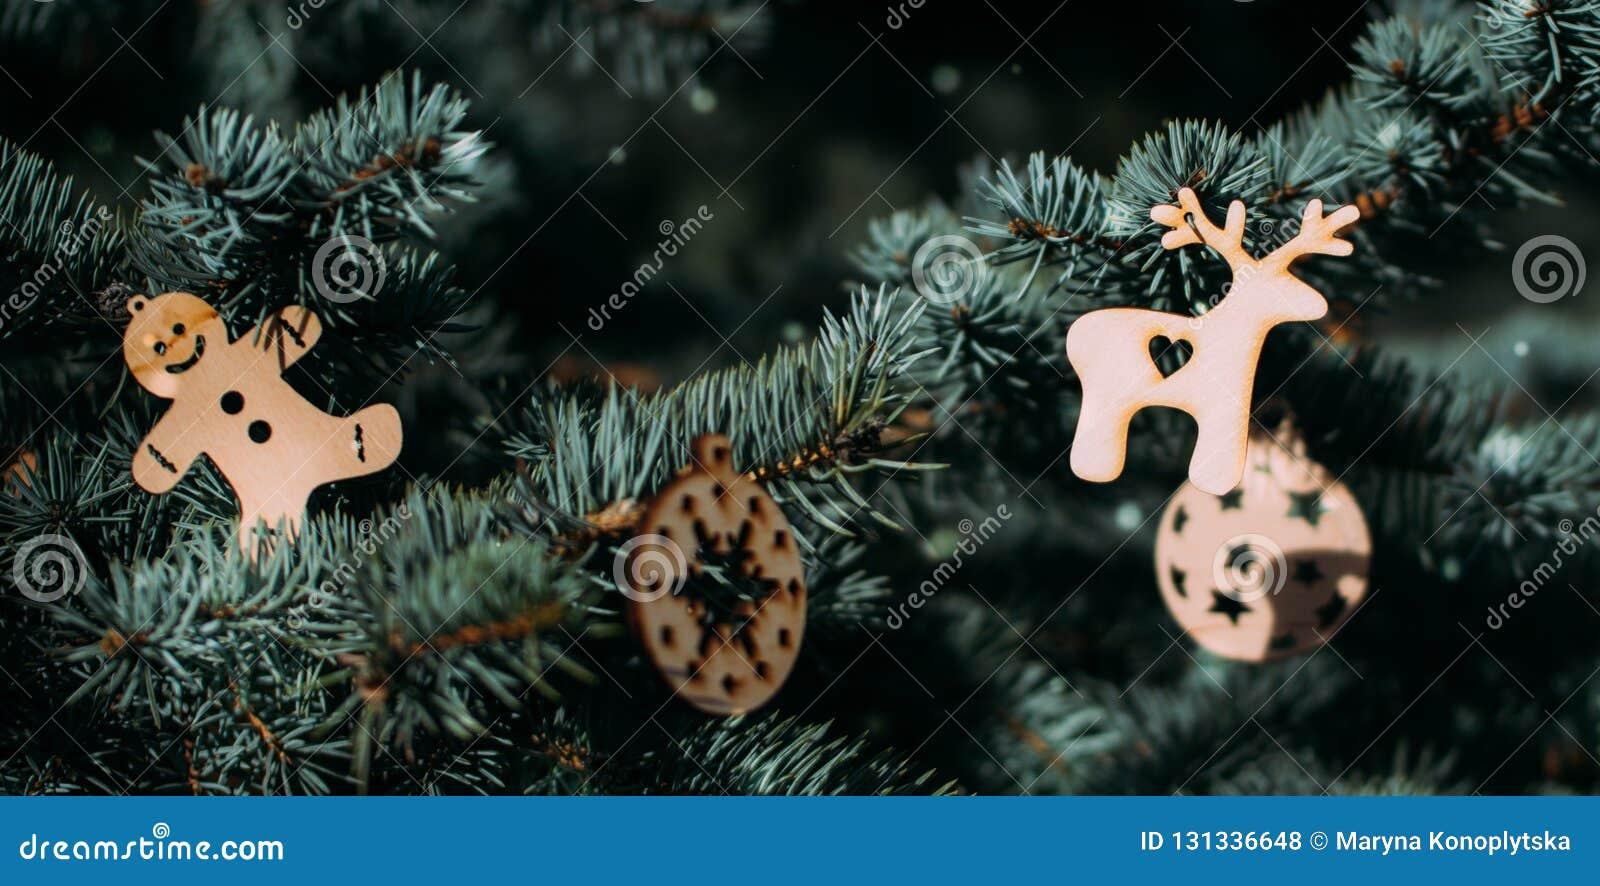 Christmas Tree And Beautiful Christmas Decorations Stock Photo Image Of Decor Design 131336648